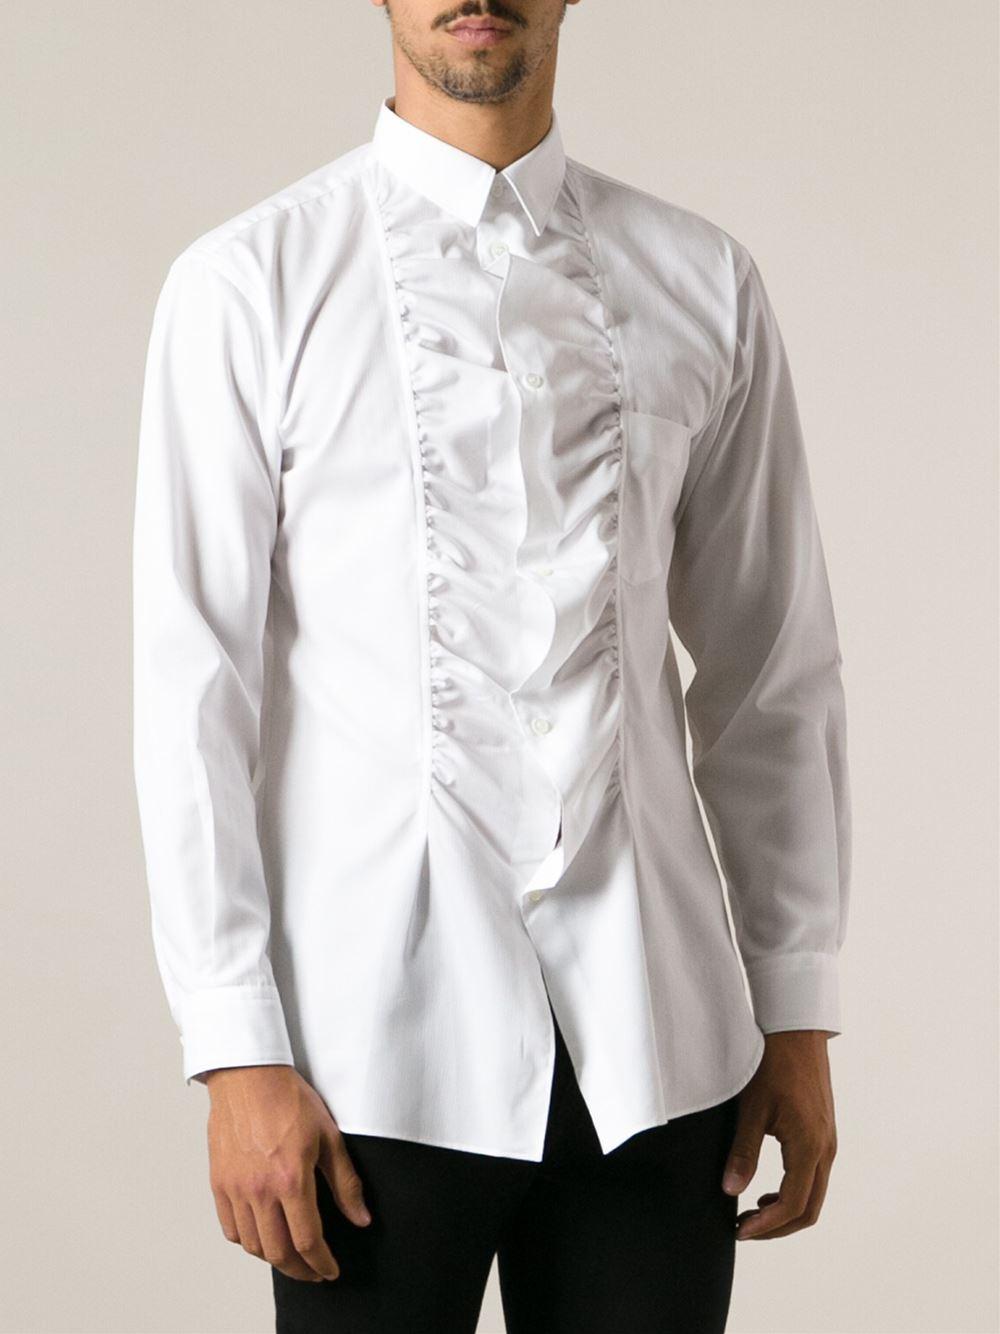 ESCADA Ruffled Blouse in White - Lyst |Ruffle Shirt